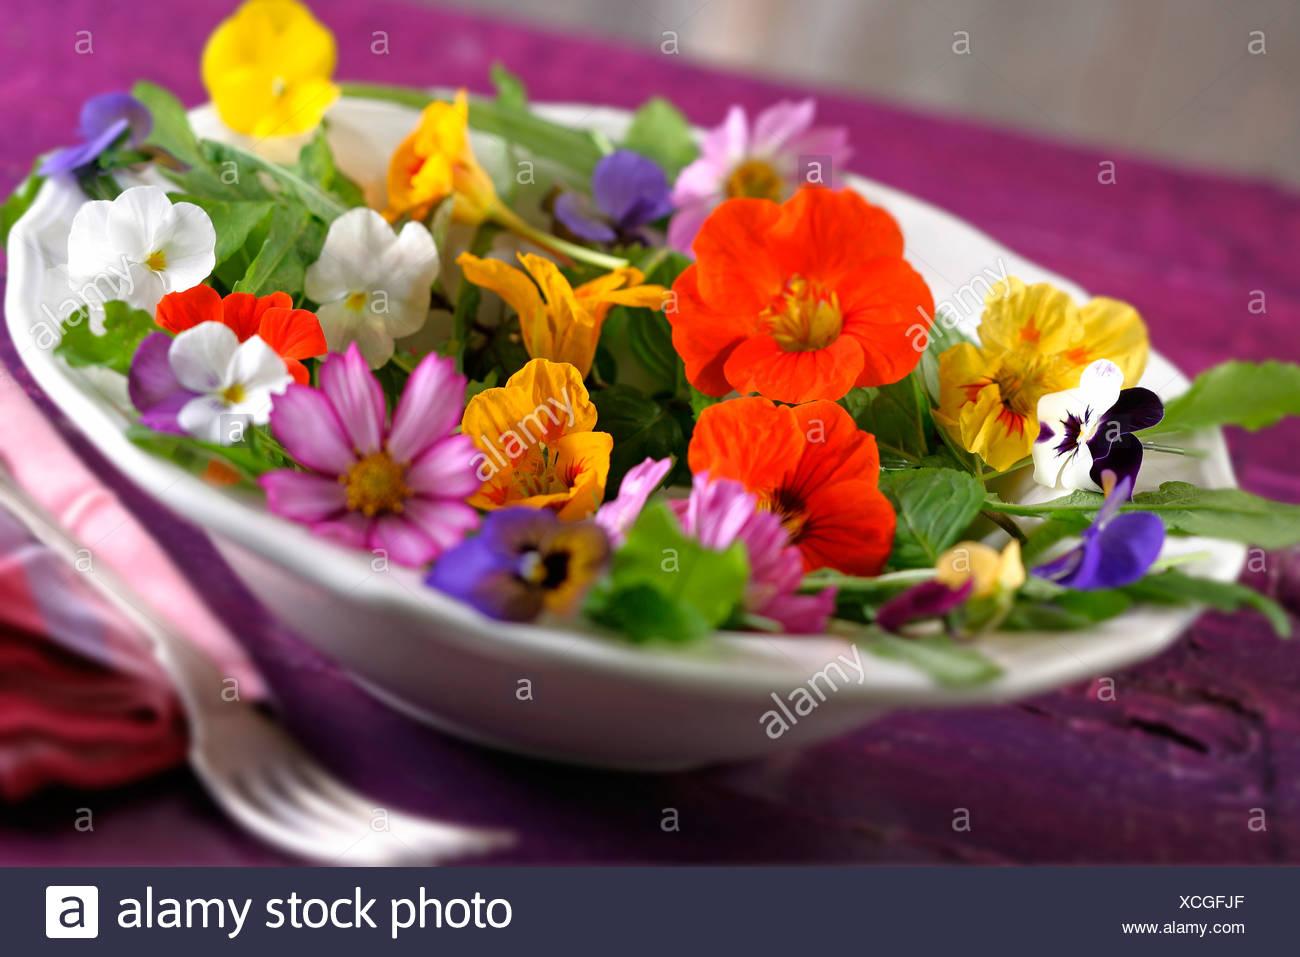 Edible Flower Arrangement Stock Photos & Edible Flower Arrangement ...